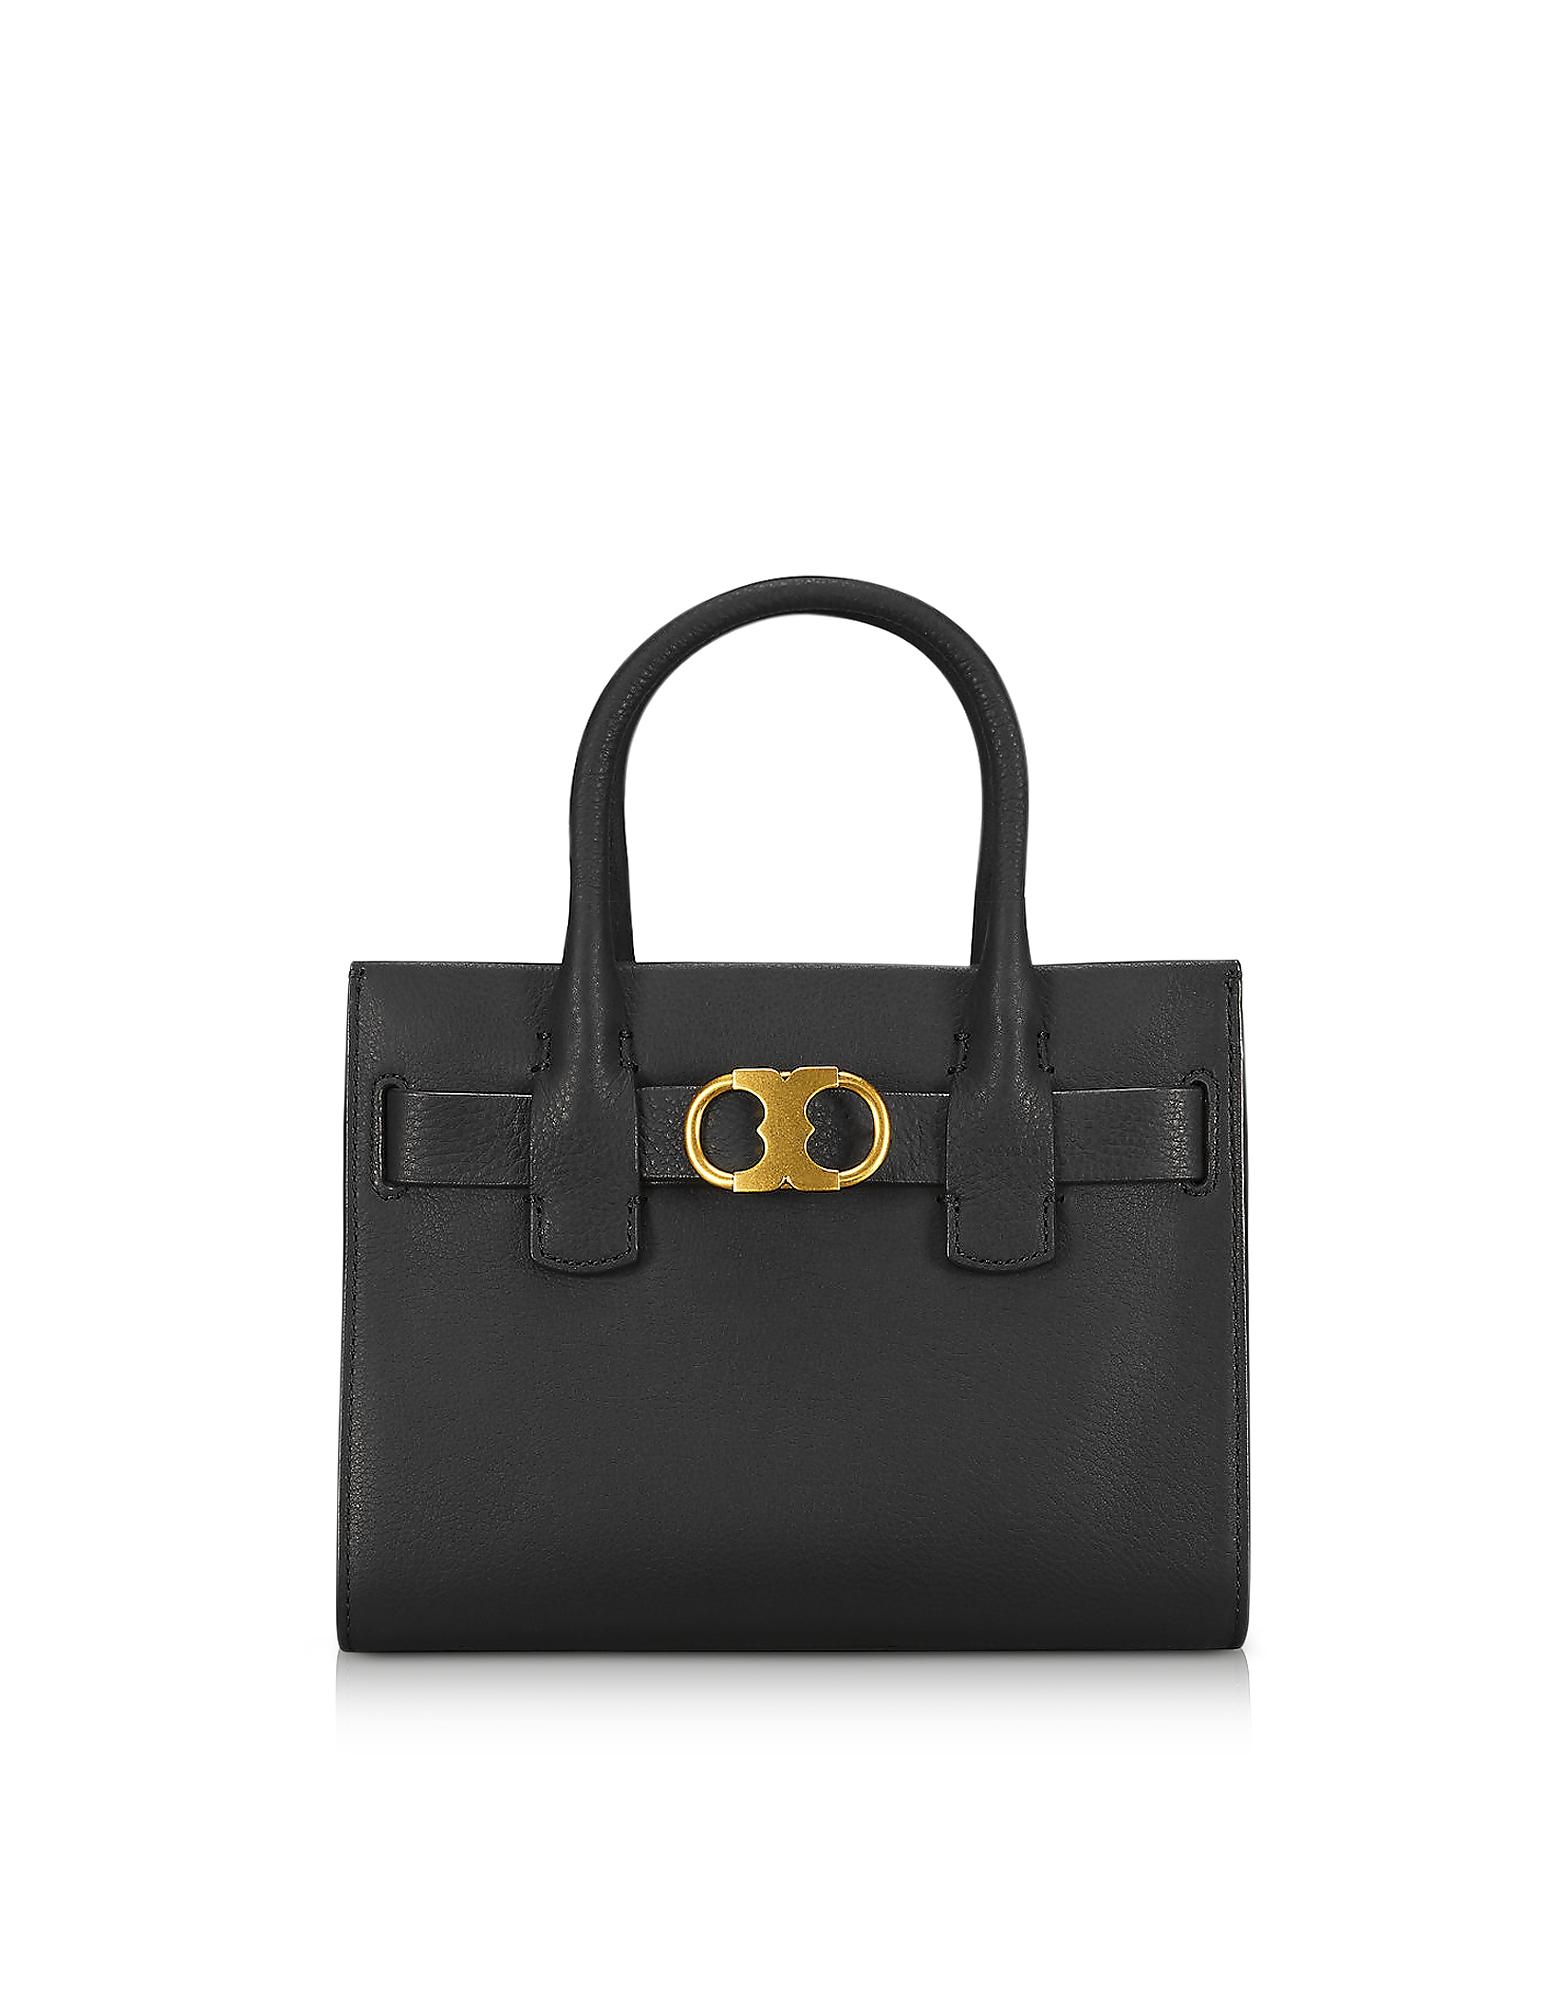 Tory Burch Handbags, Gemini Link Black Leather Small Tote Bag